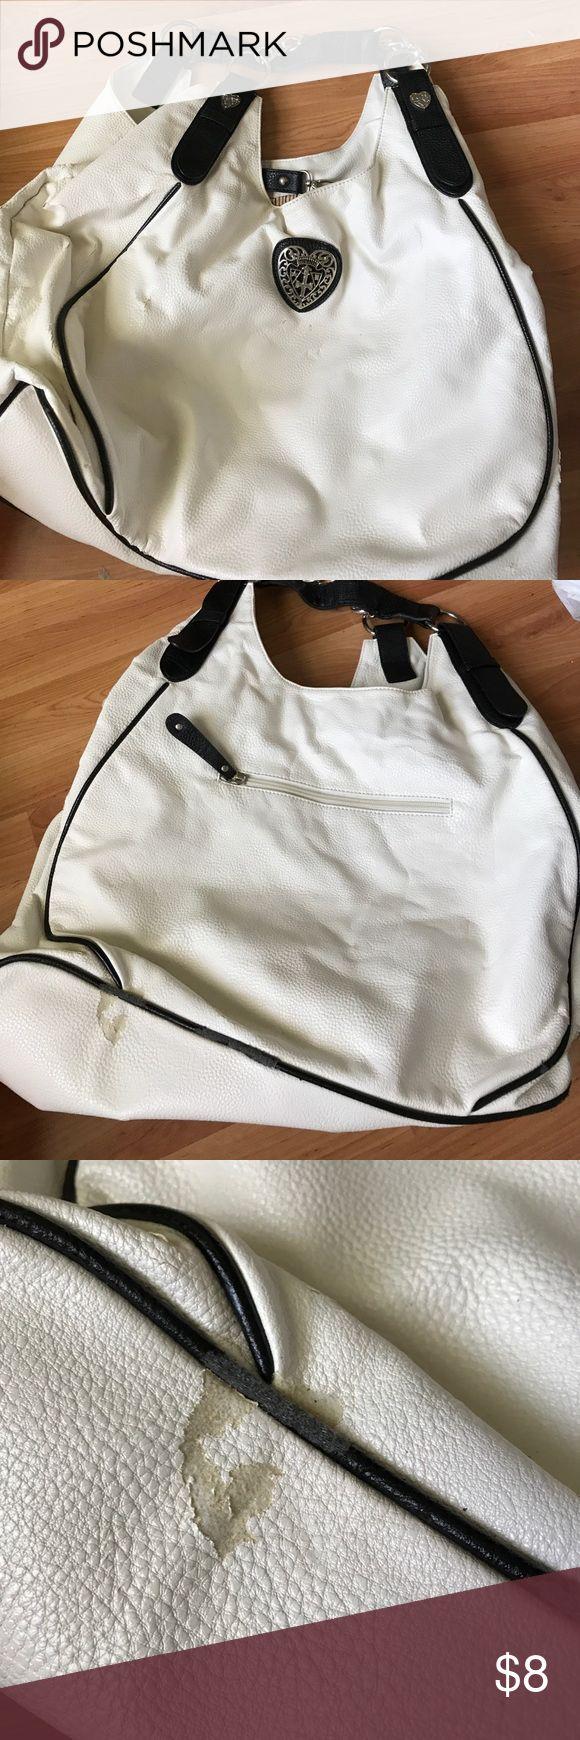 Black and white purse Black and white large handbag Bags